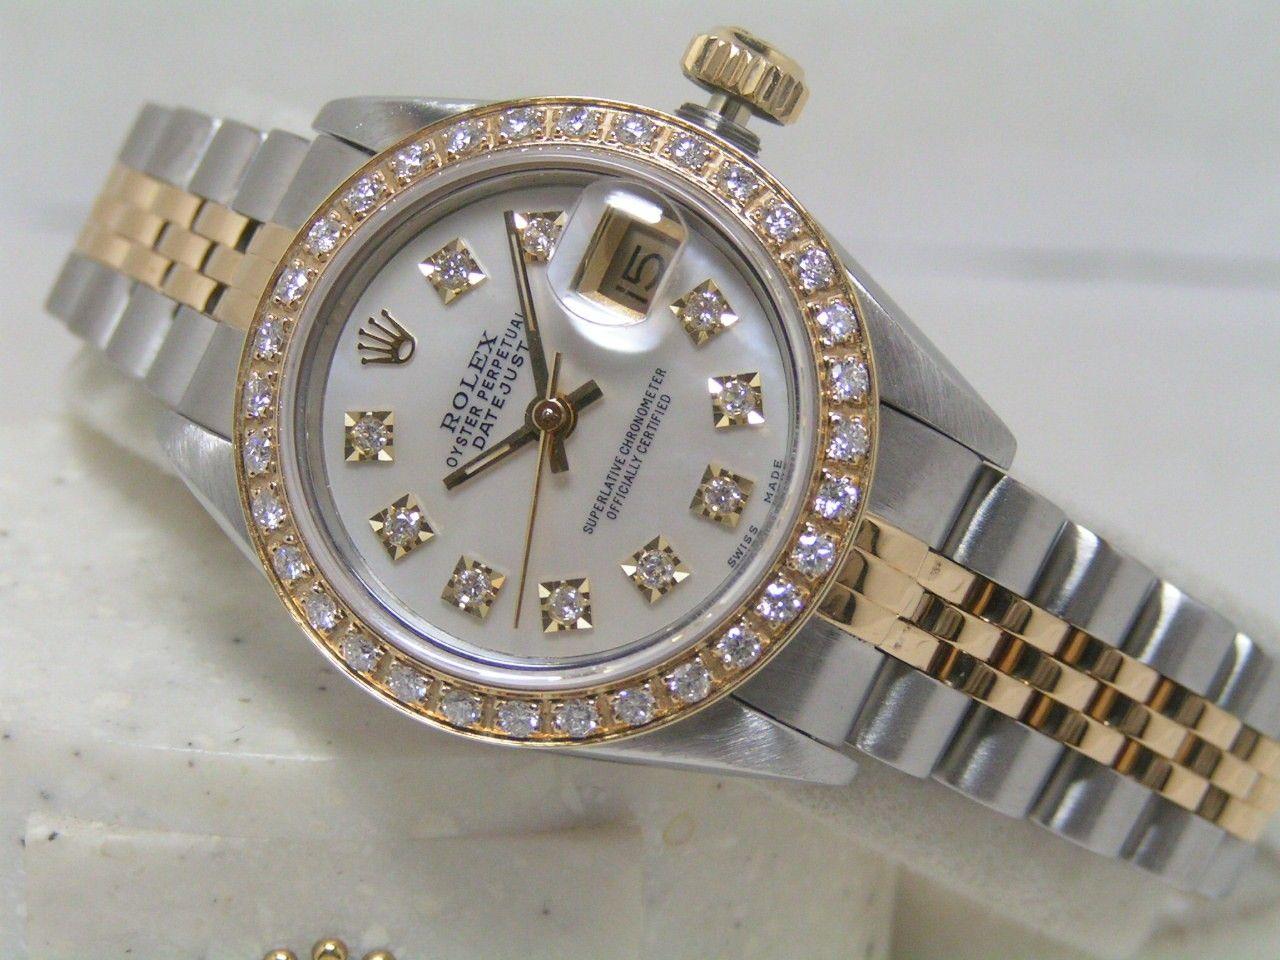 22455c0f512 Rolex 69173 Ladies DateJust White MOP Diamond Dial-Bezel SS/18kt Solid Gold  - $5,995